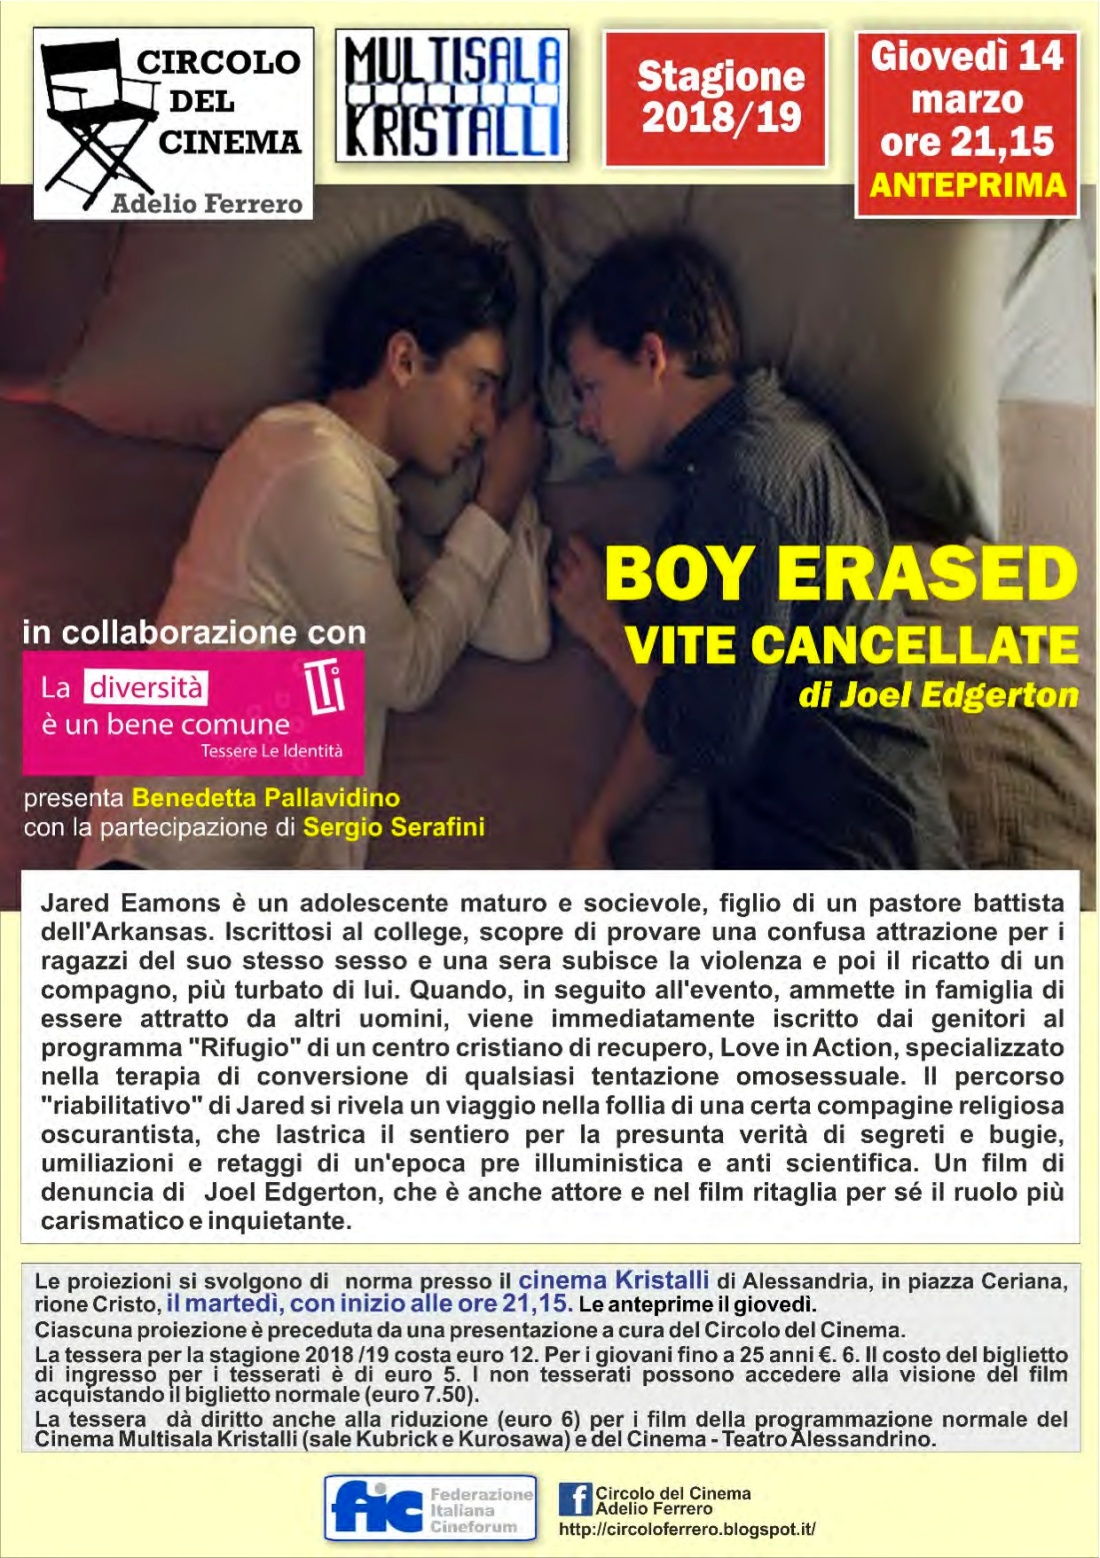 Boy erased_edgerton_10_r